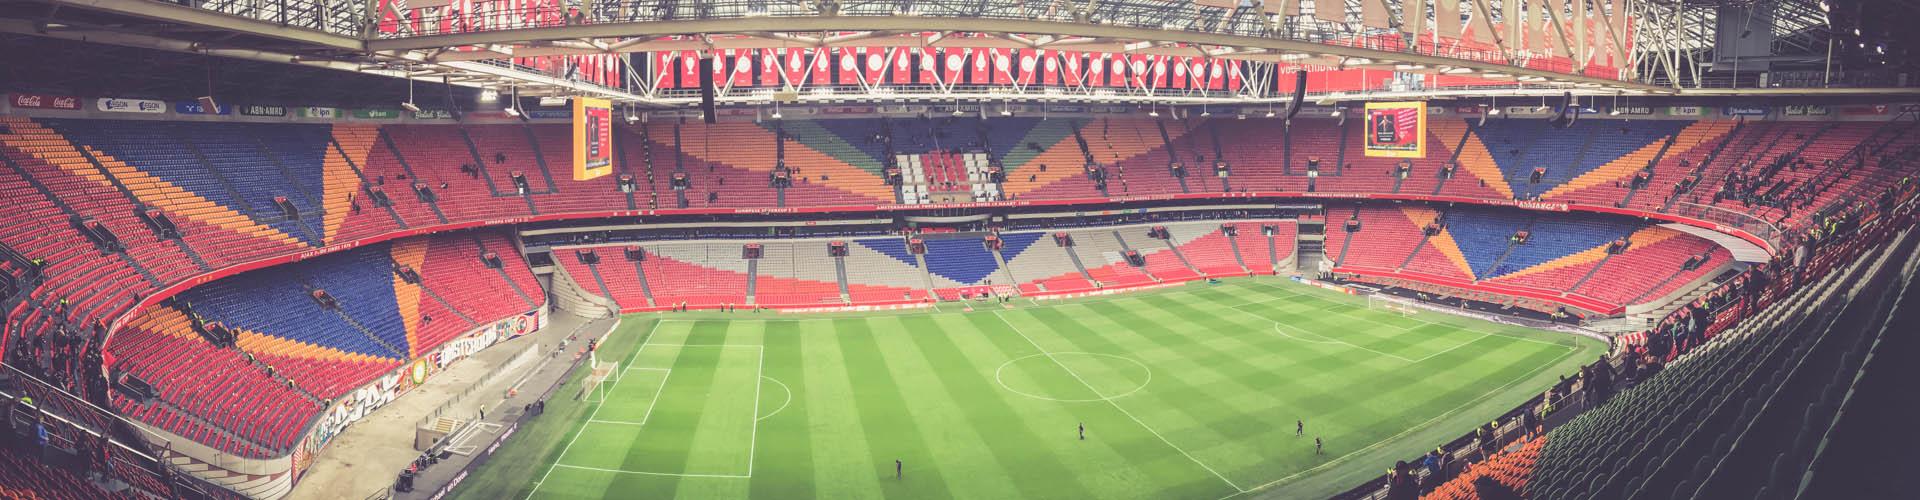 Johan-Cruyff-Arena, Amsterdam